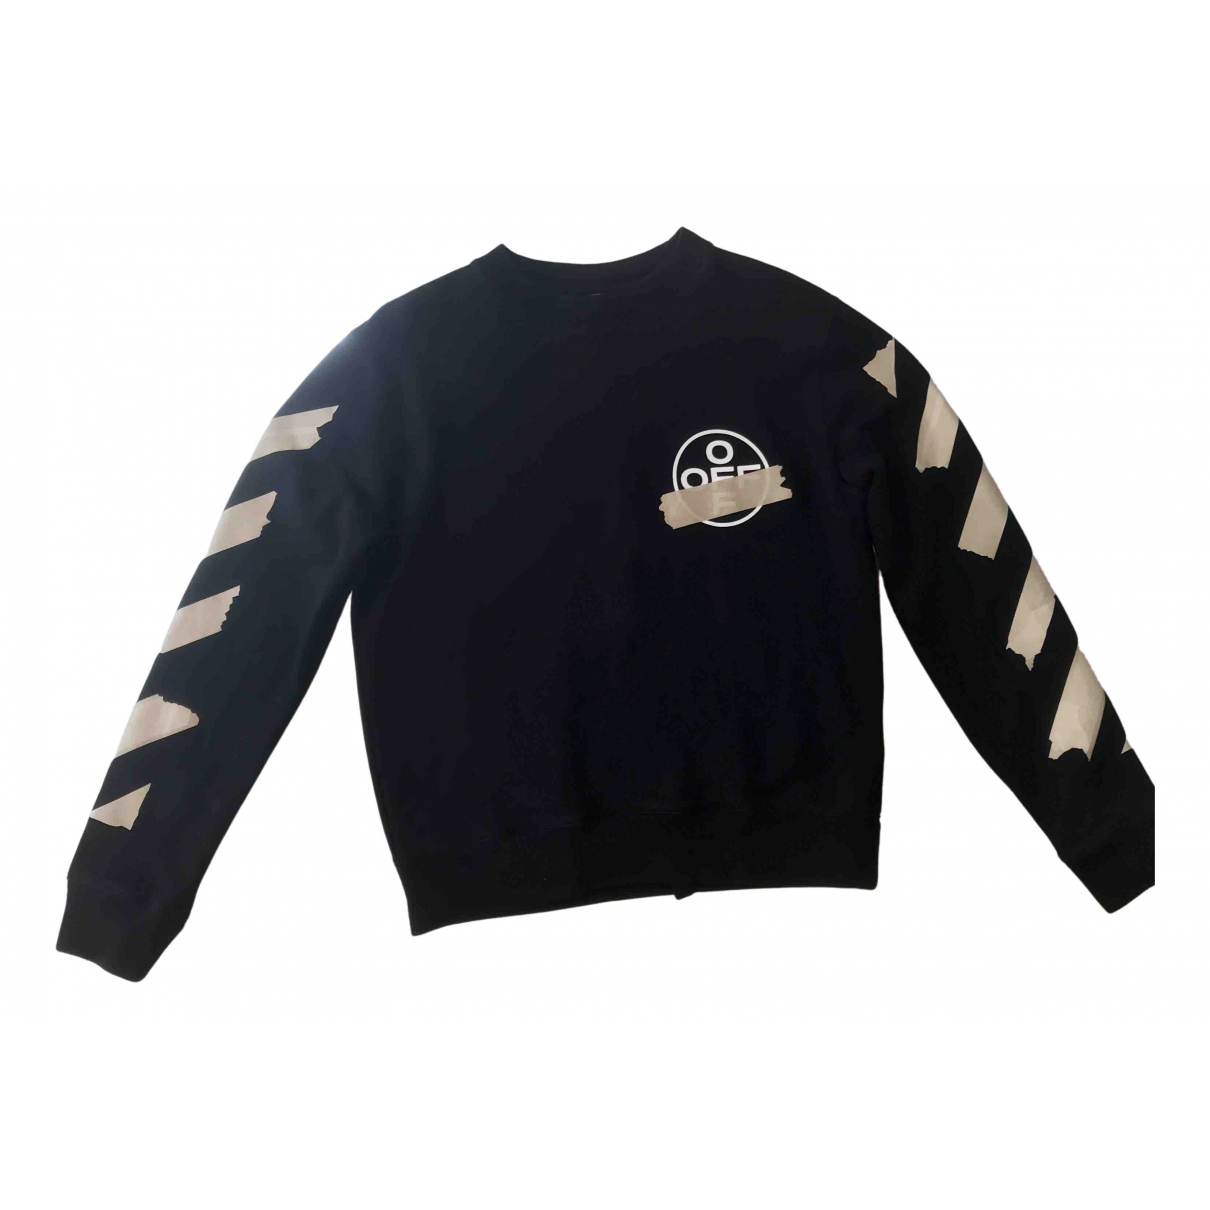 Off-white N Black Cotton Knitwear & Sweatshirts for Men S International